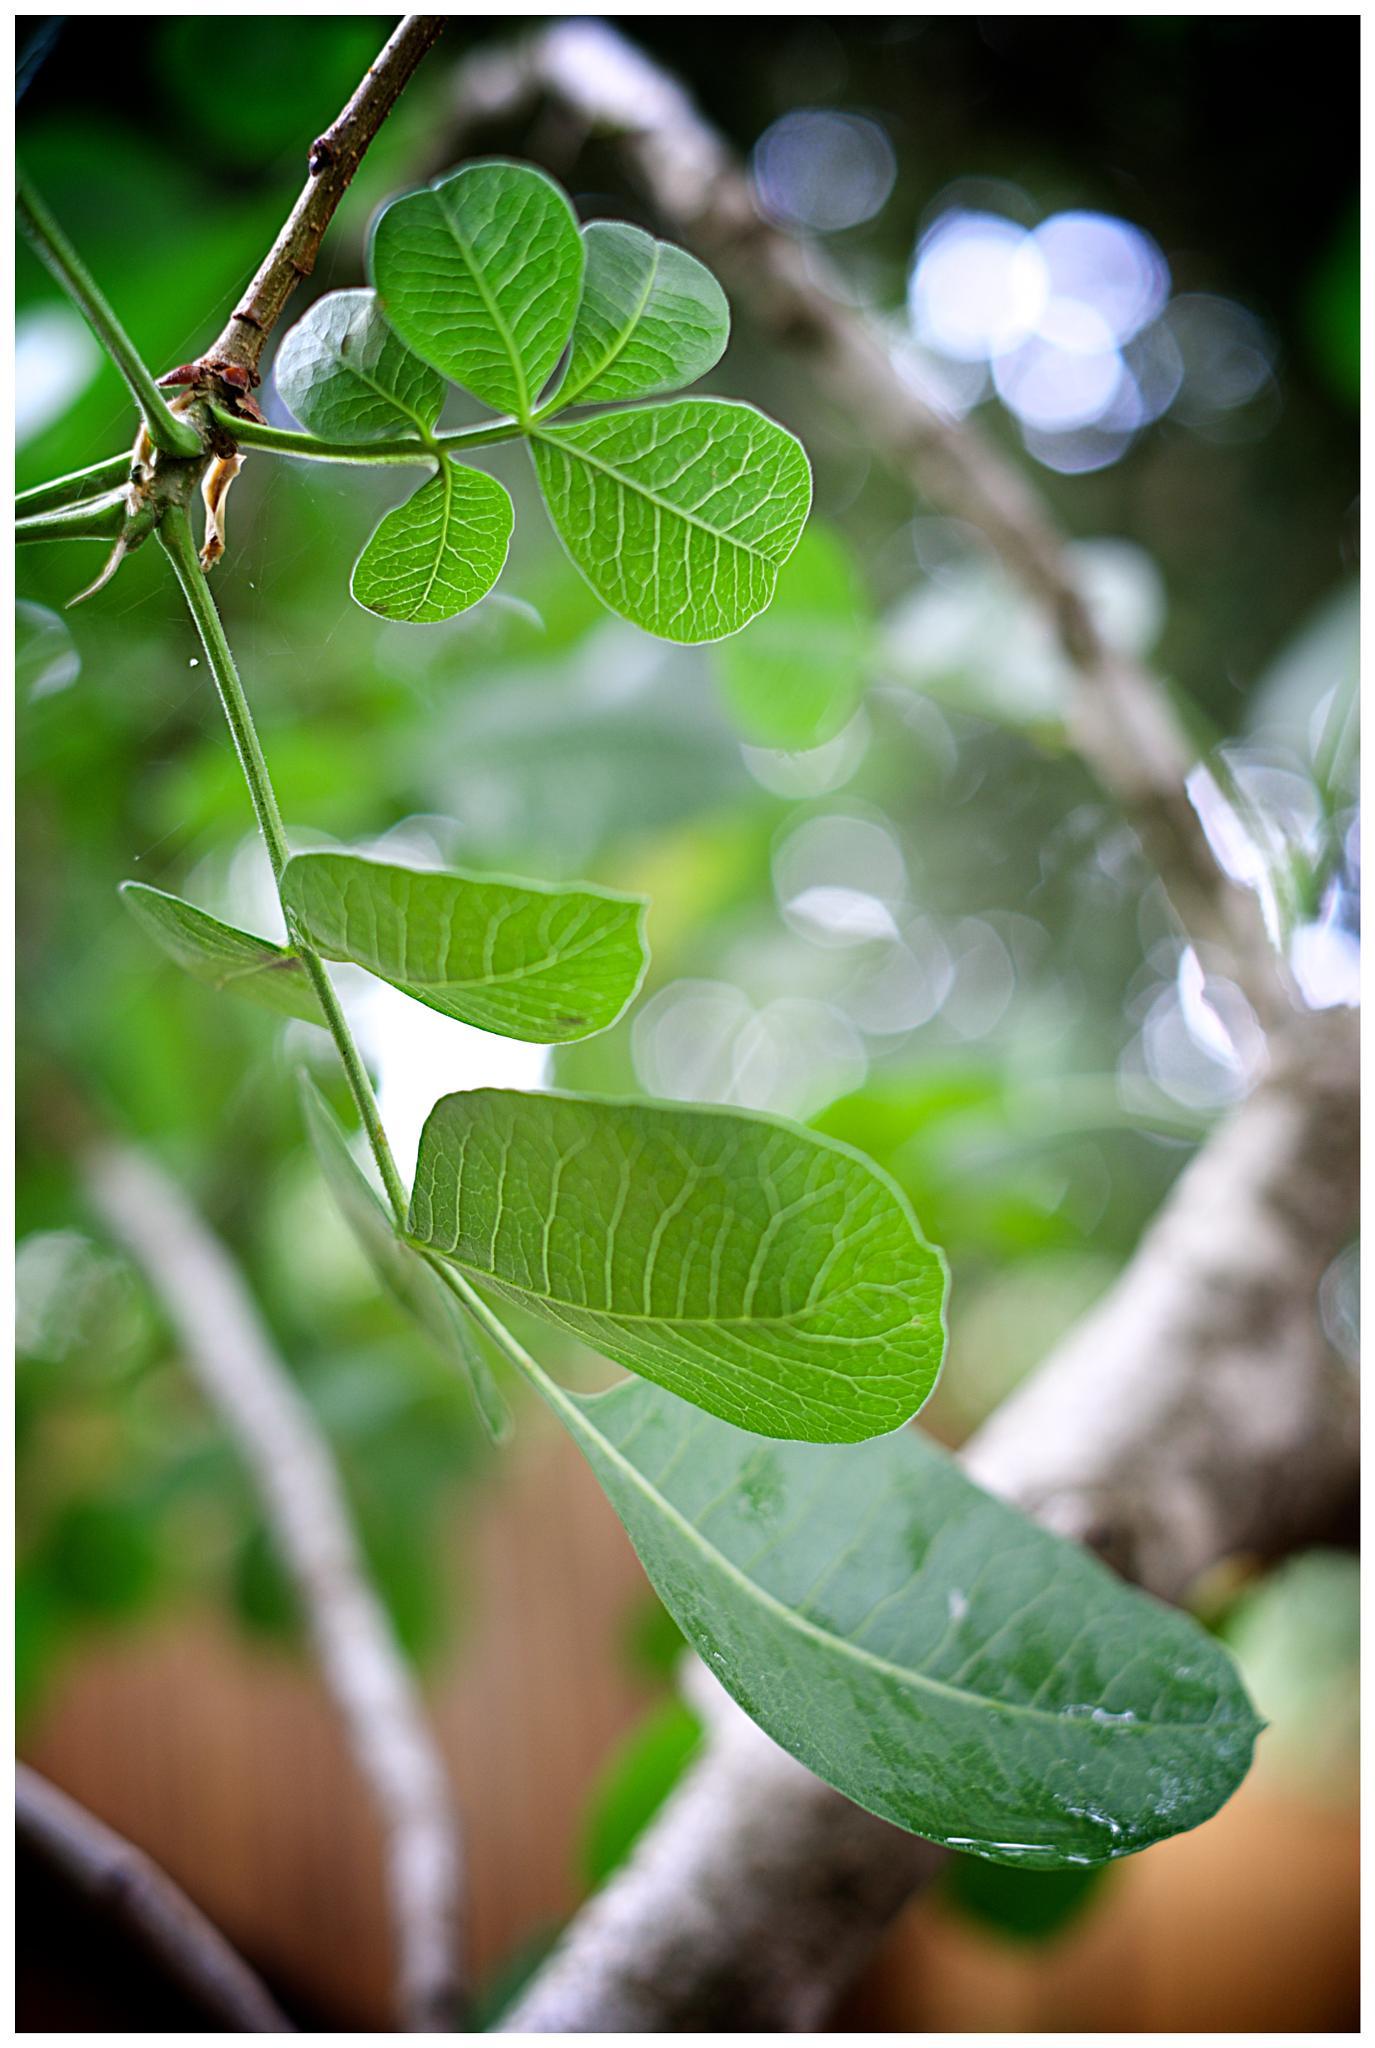 The leaf by David Plotnikov